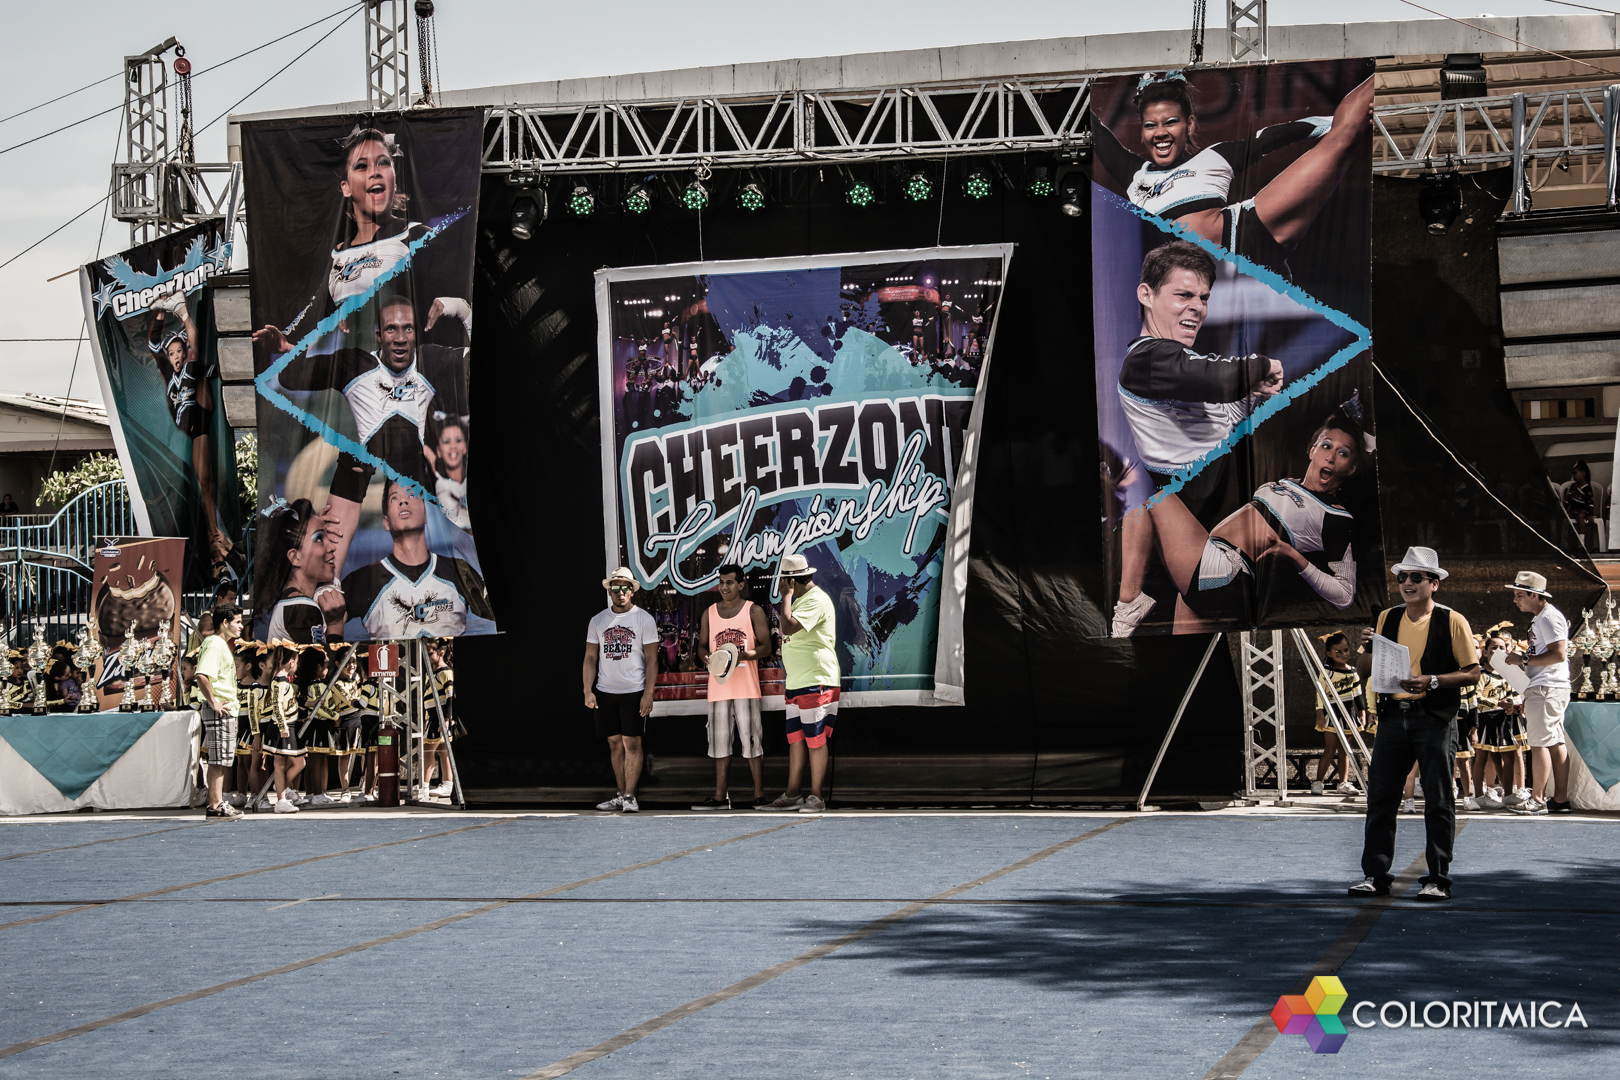 Campeonato Cheerzone – Salinas